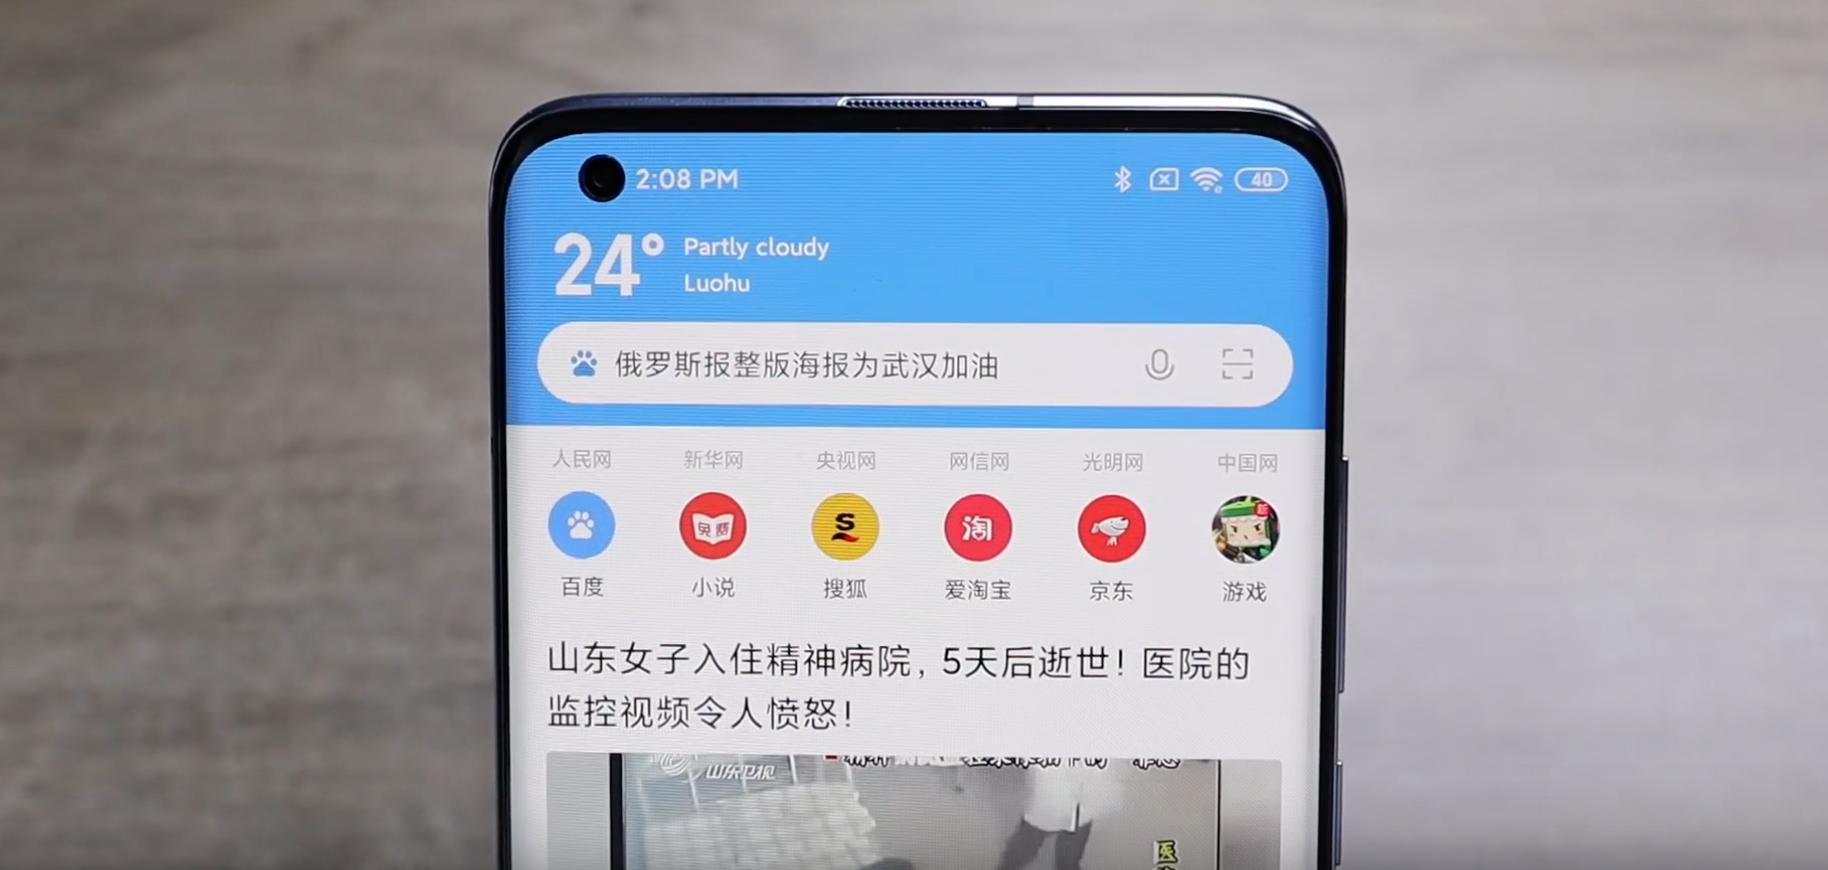 Xiaomi Mi 10 launch